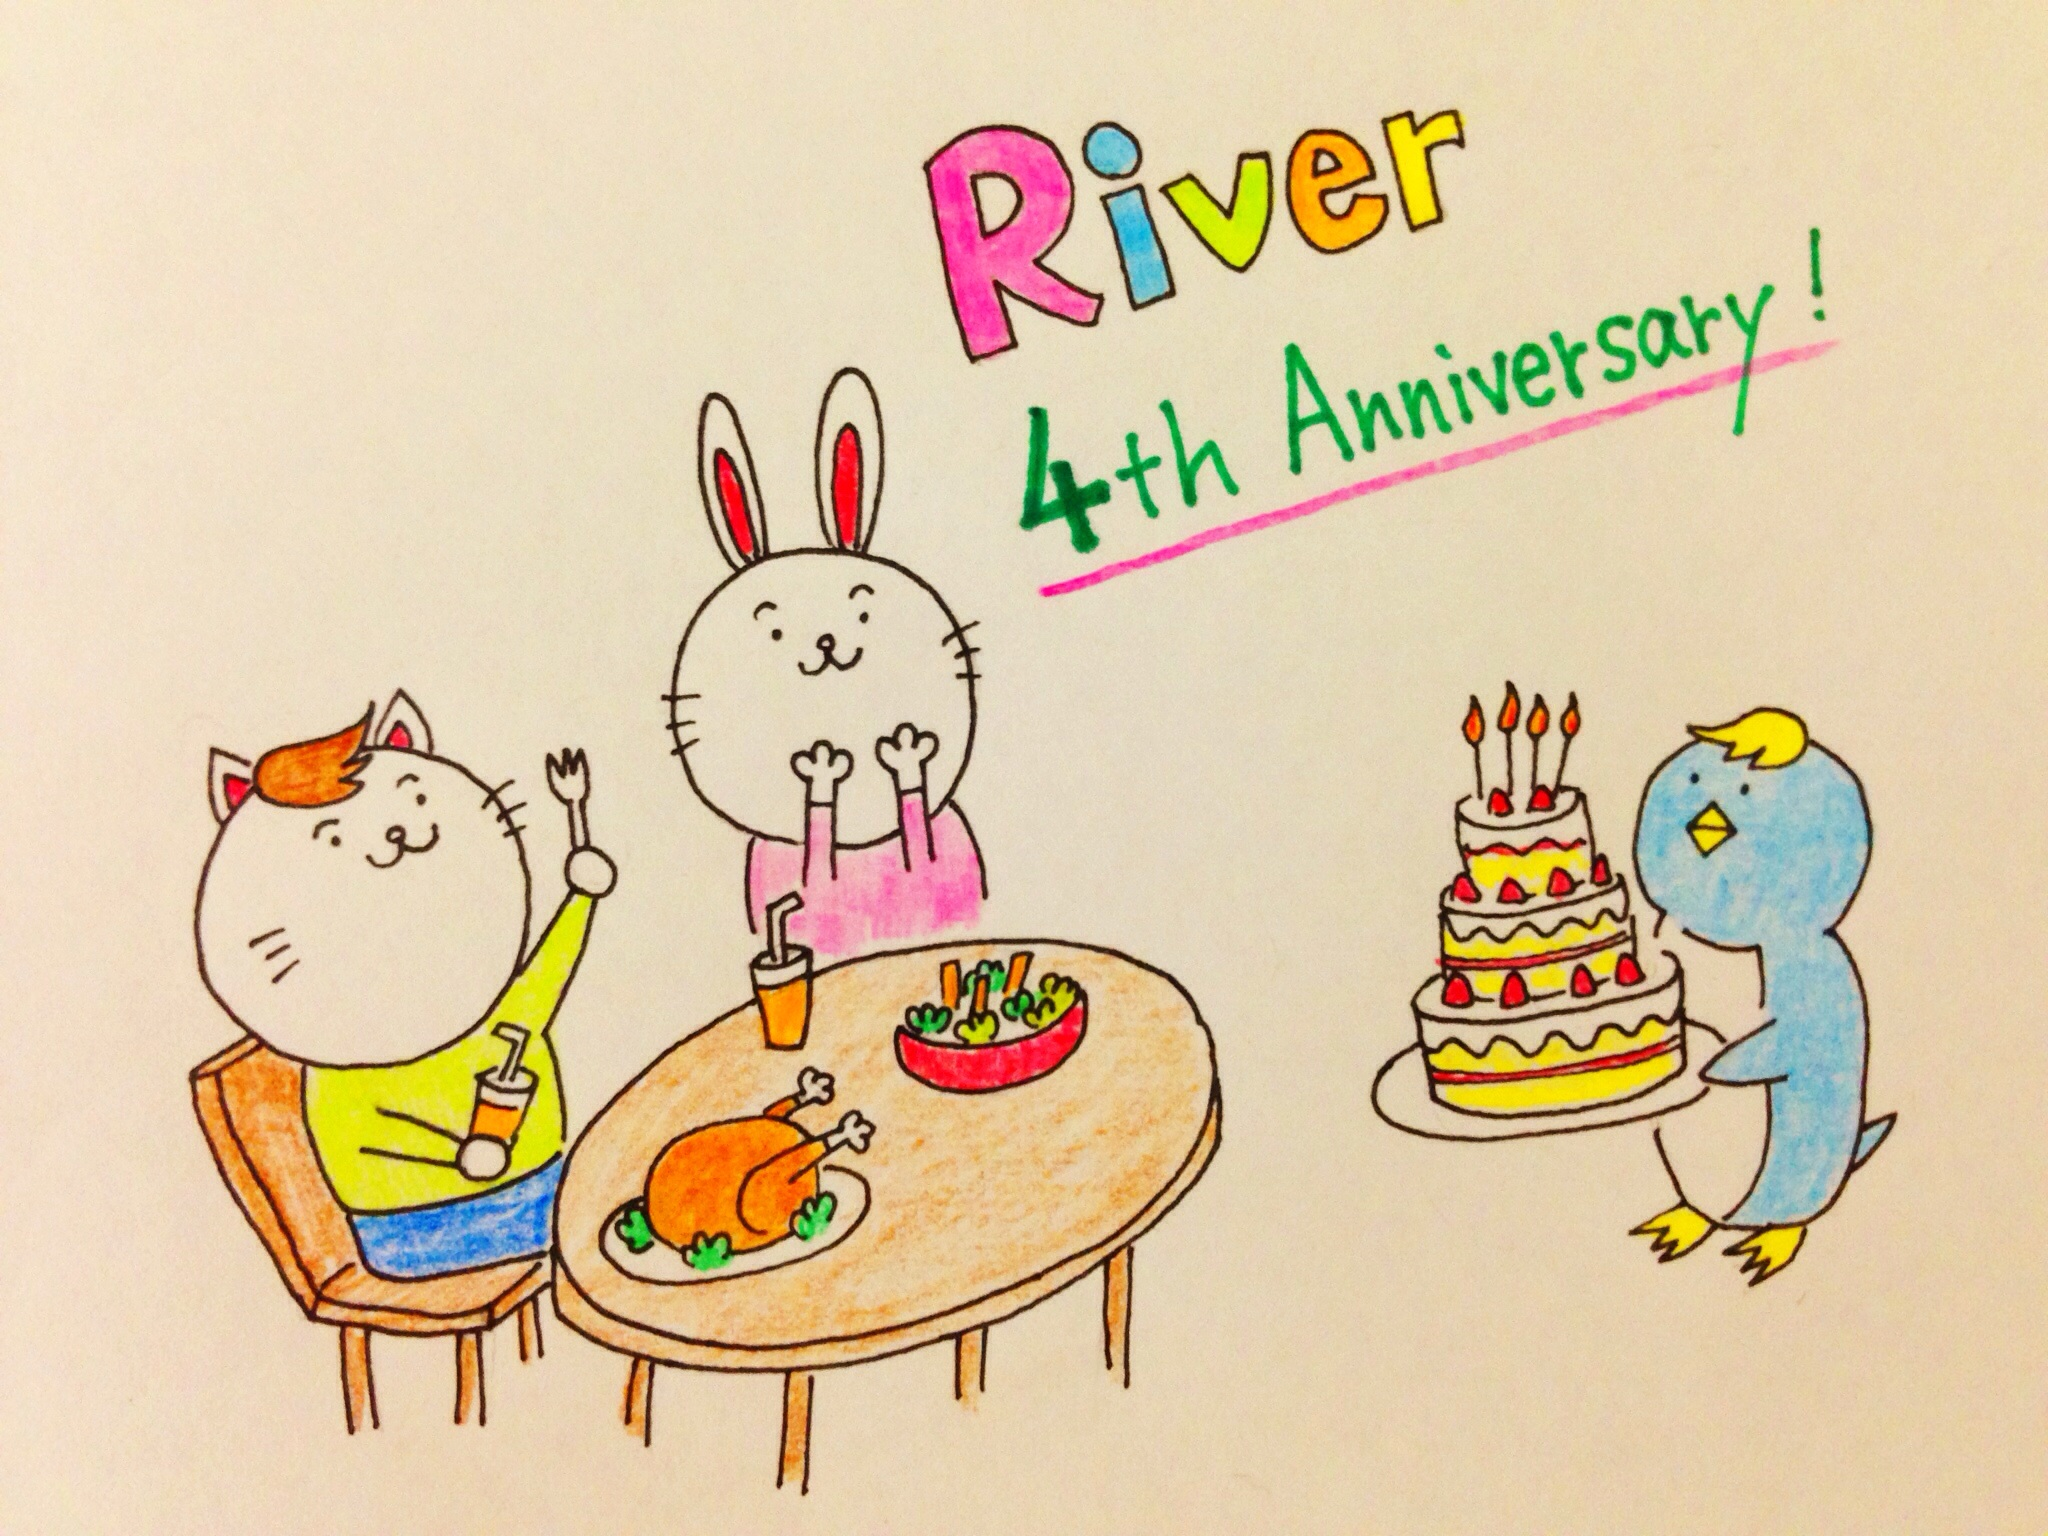 4th Anniversary !